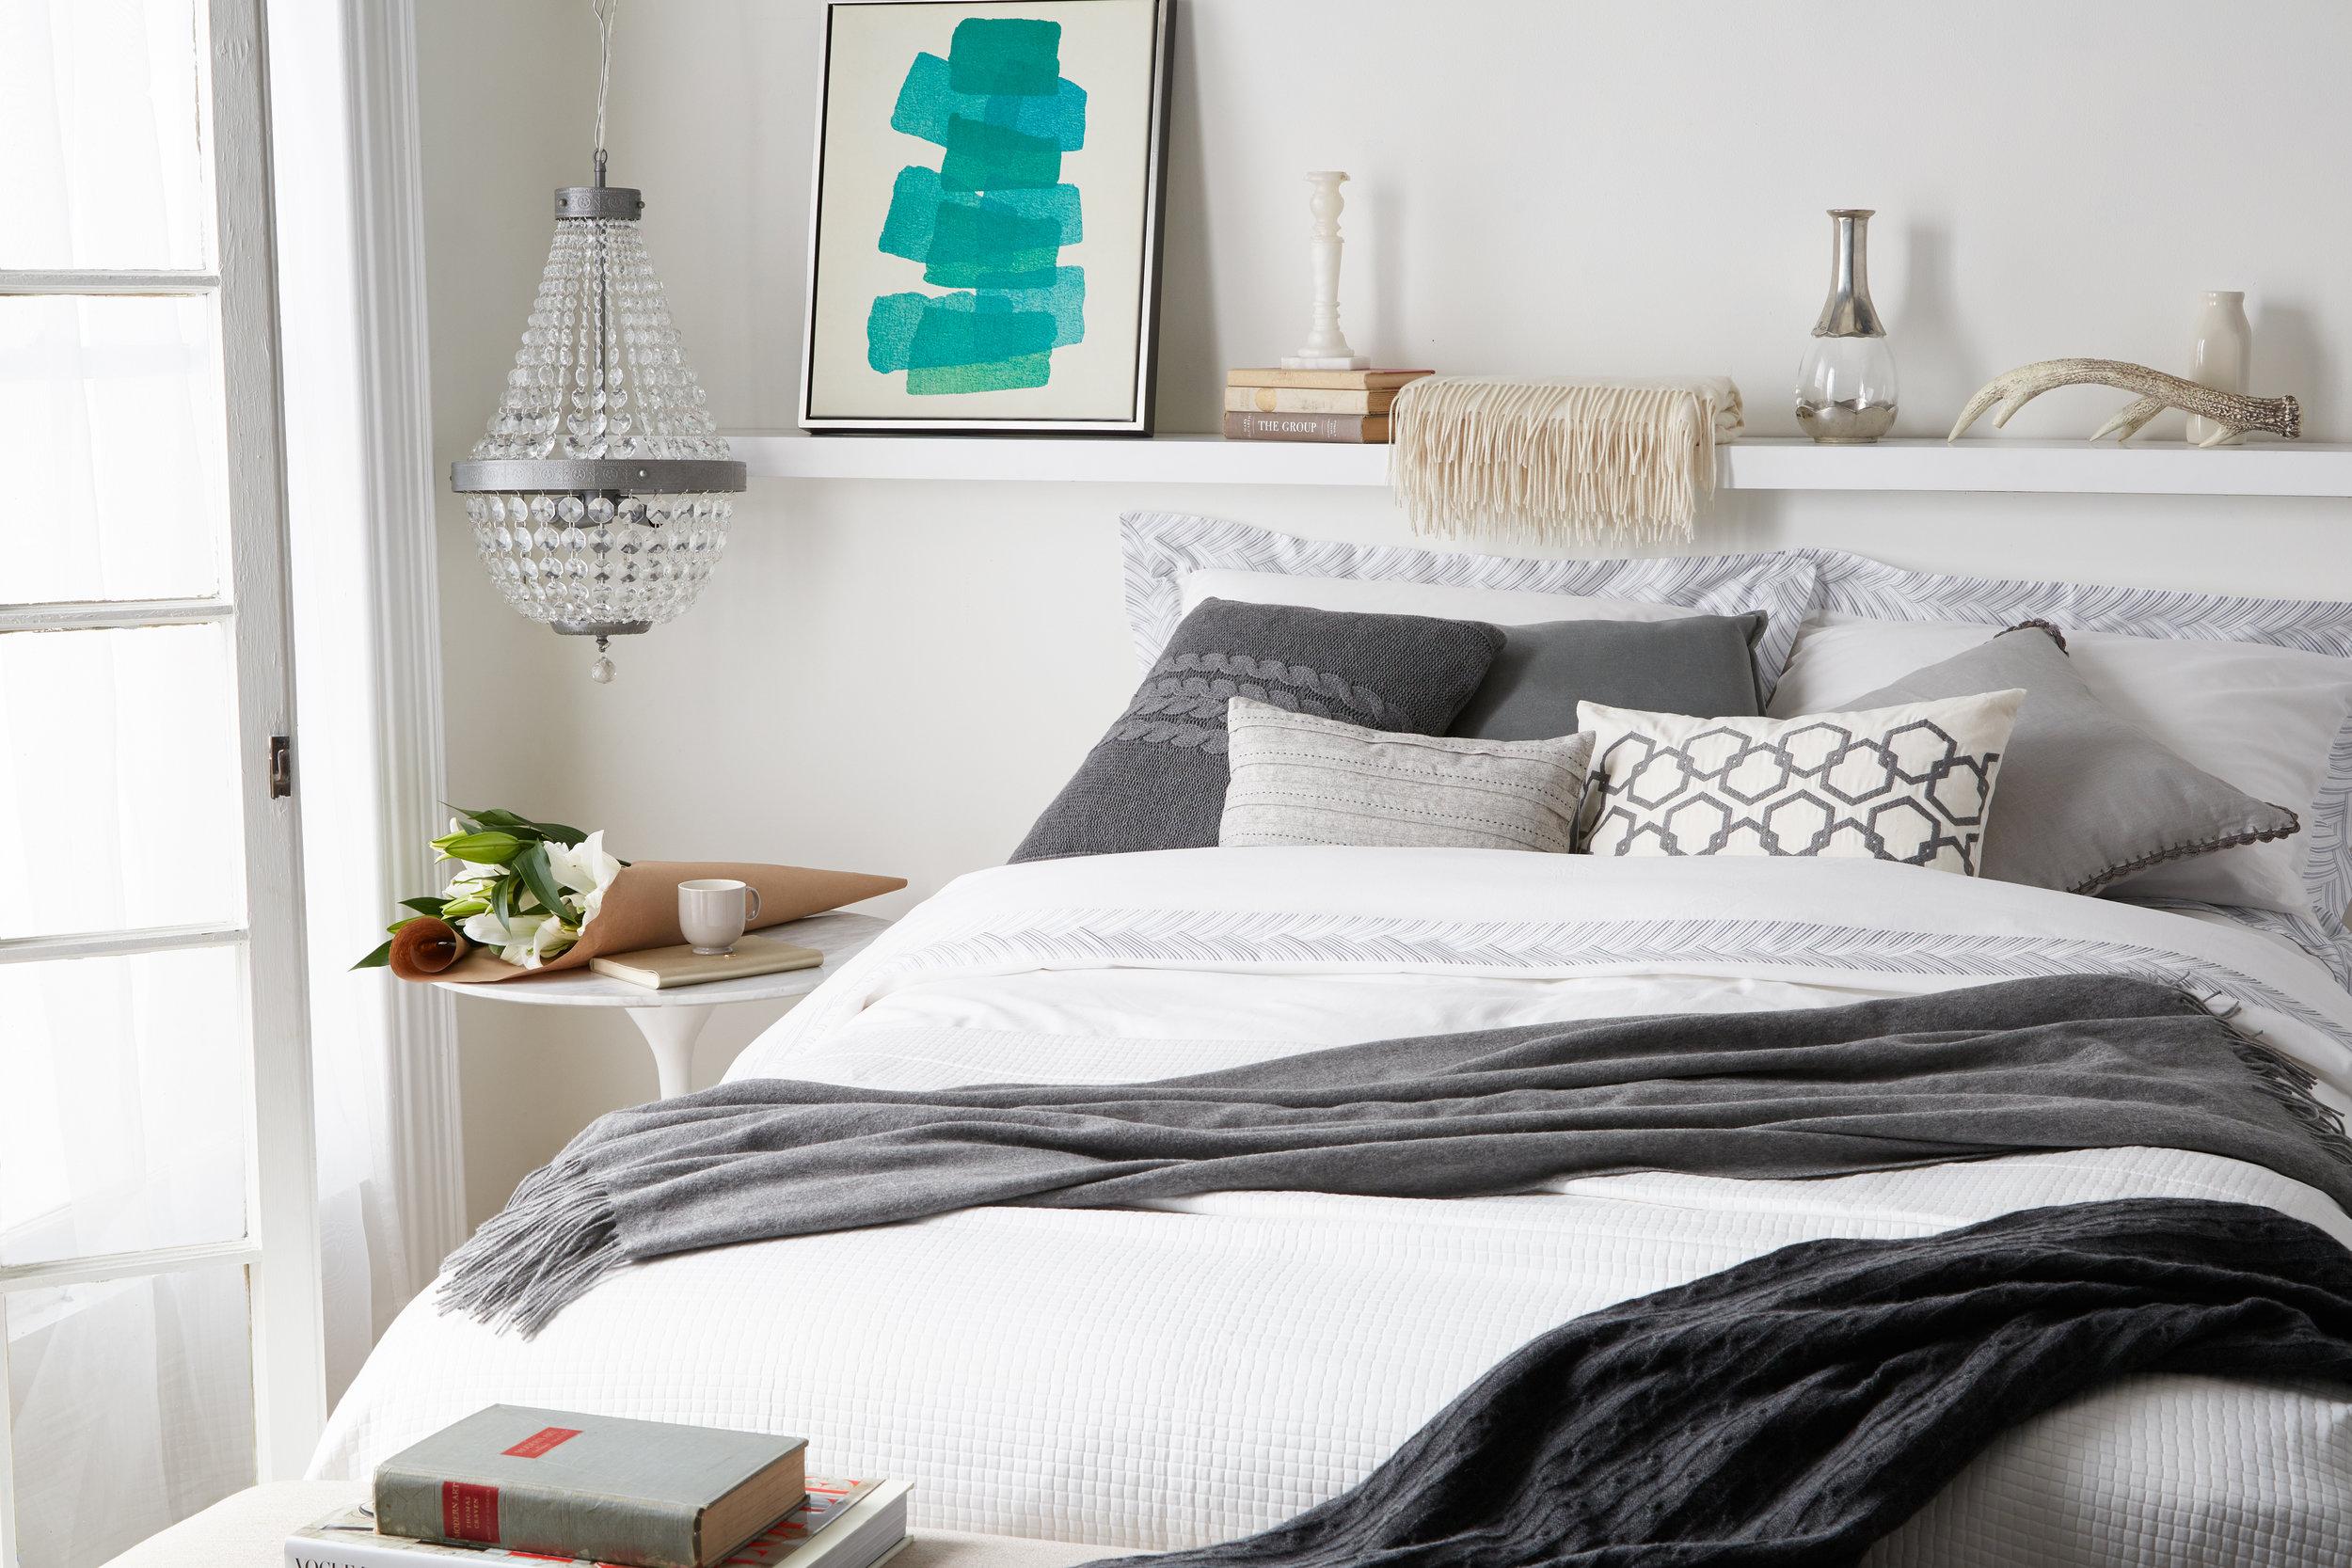 Bedding_BEDDING_AND_BATH_EVENT_SUPERHERO_HOME_1173806760_BASE.jpg